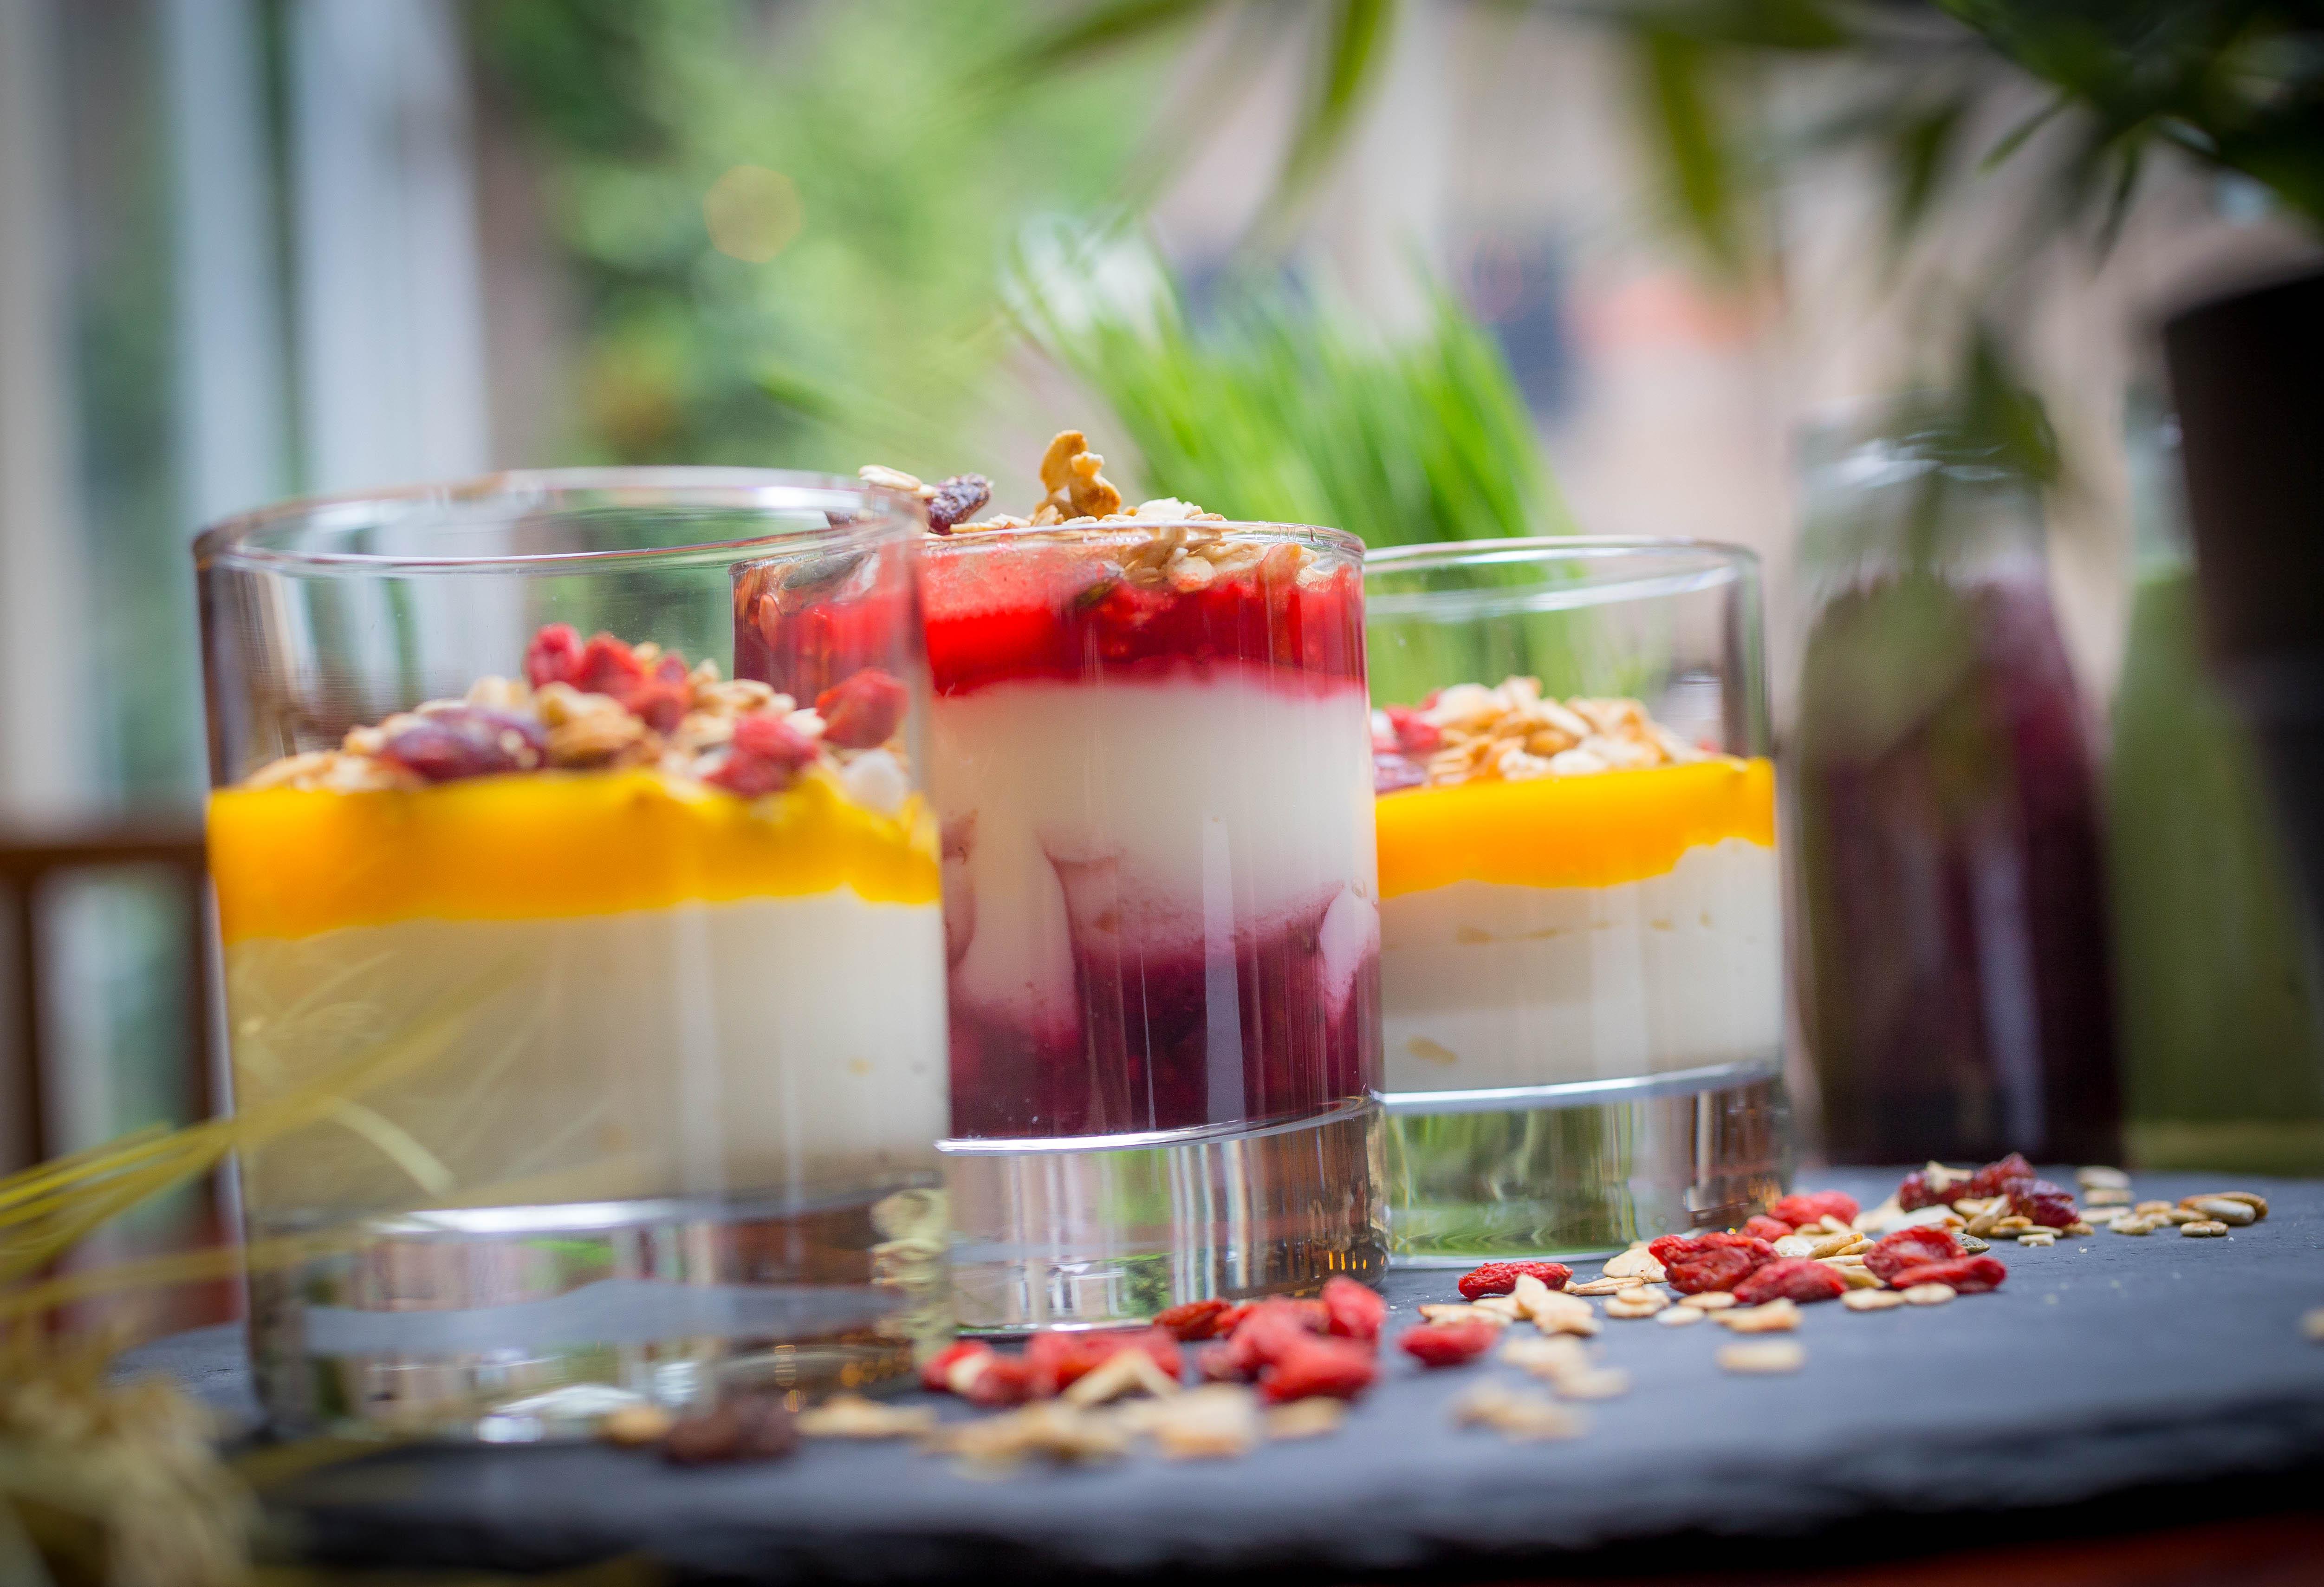 Vitality-Breakfast-yoghurt-pot-1